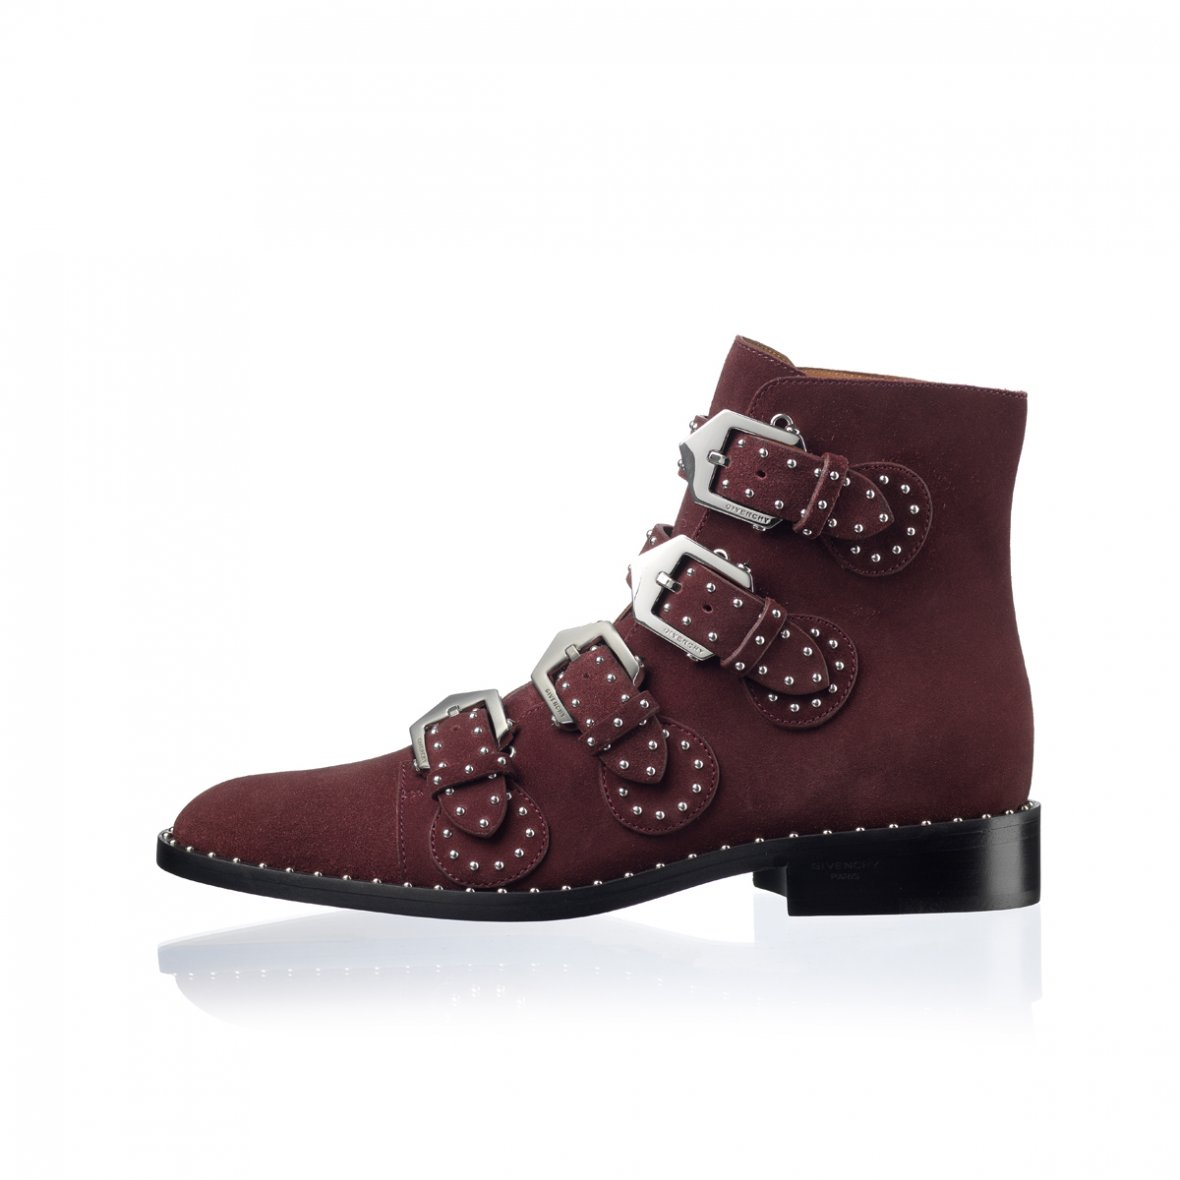 givenchy bordeaux støvle